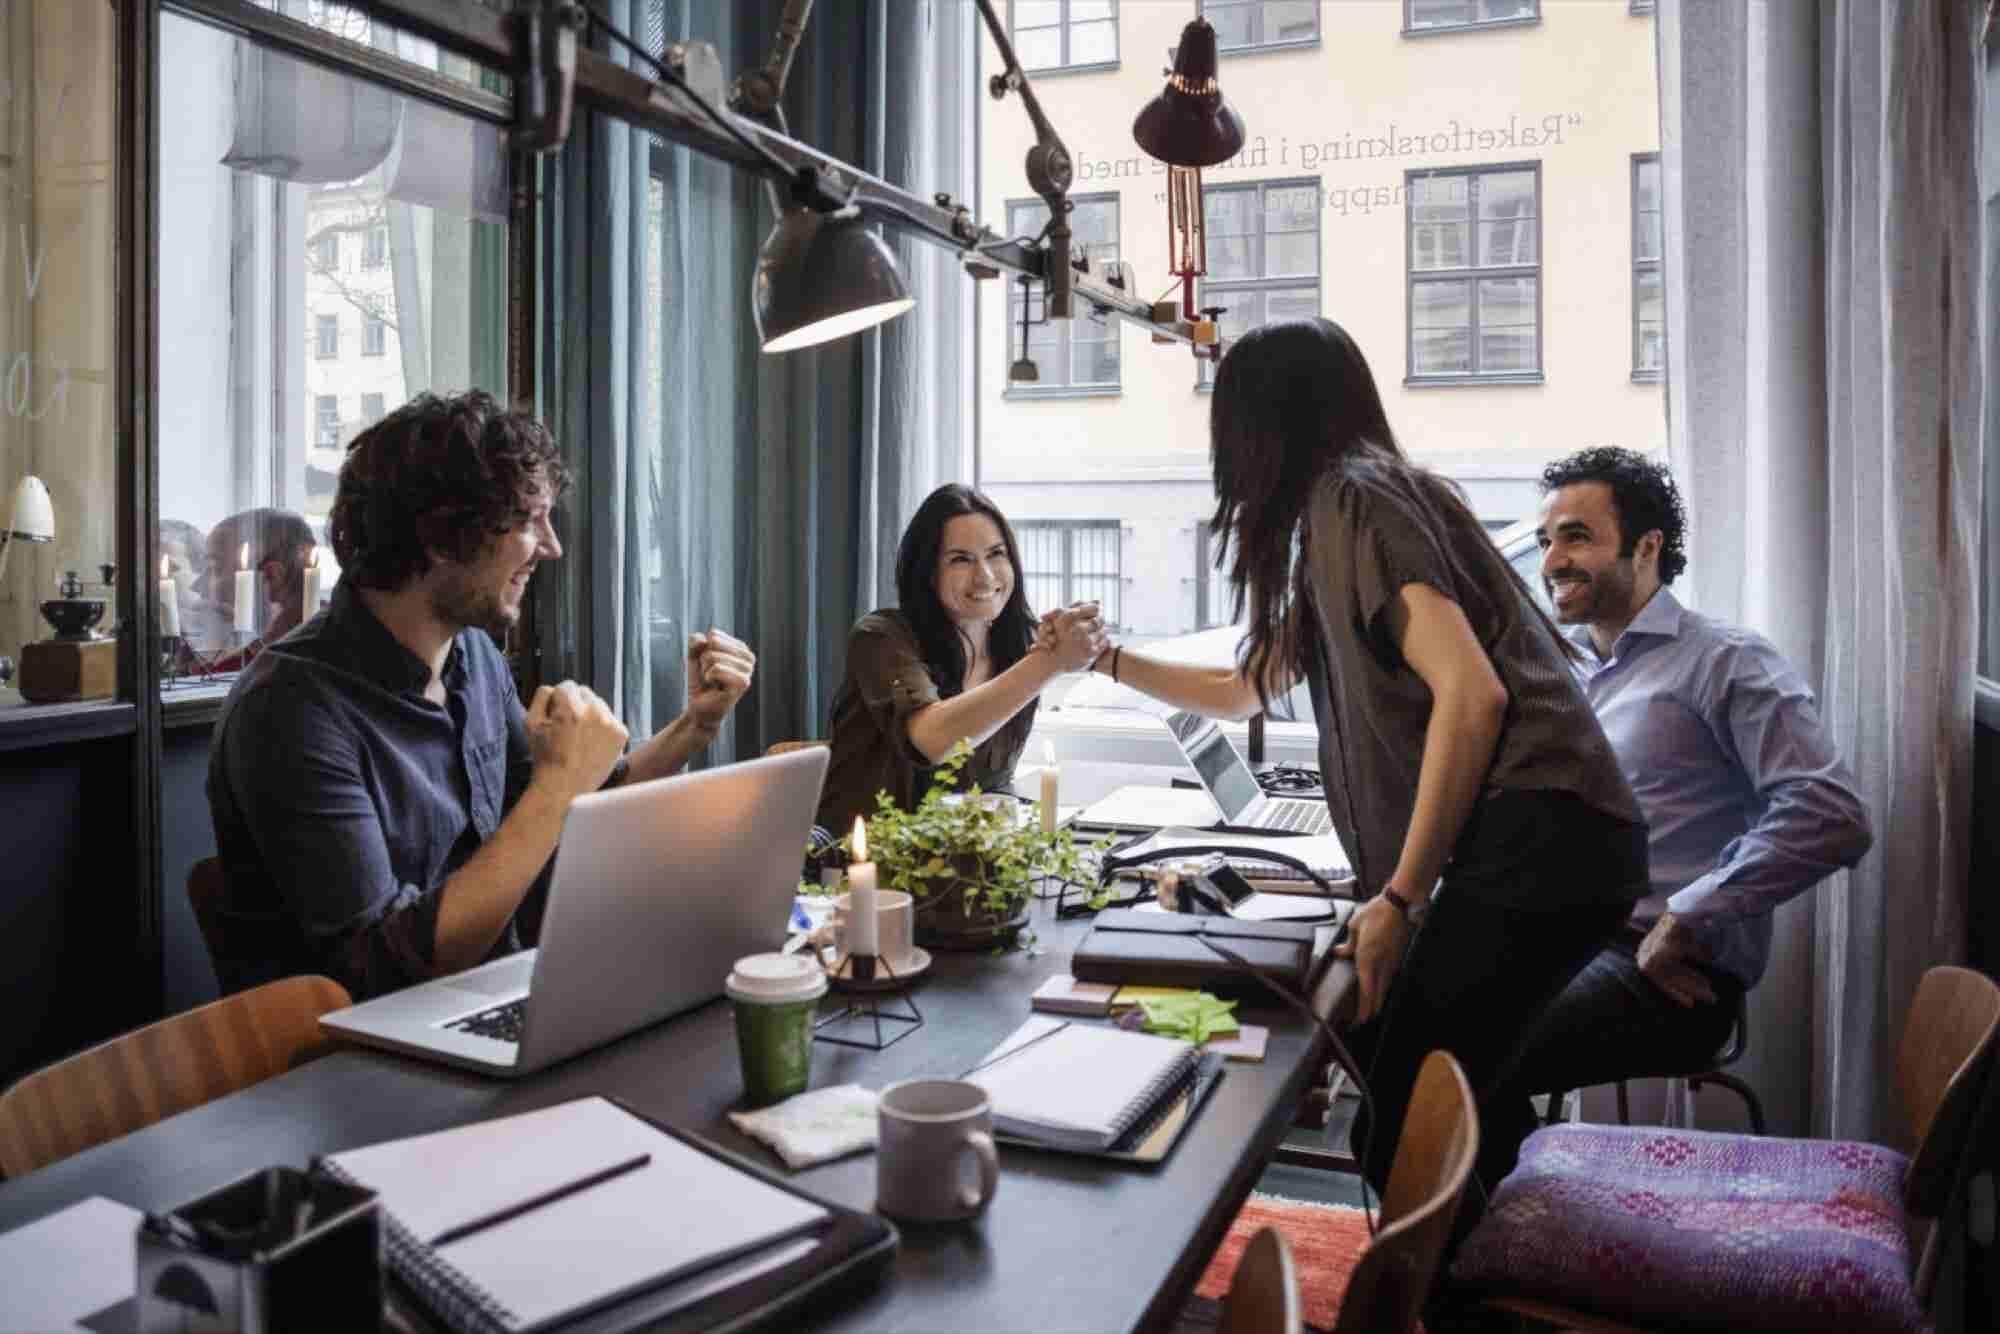 7 Keys to Building a Winning Startup Team